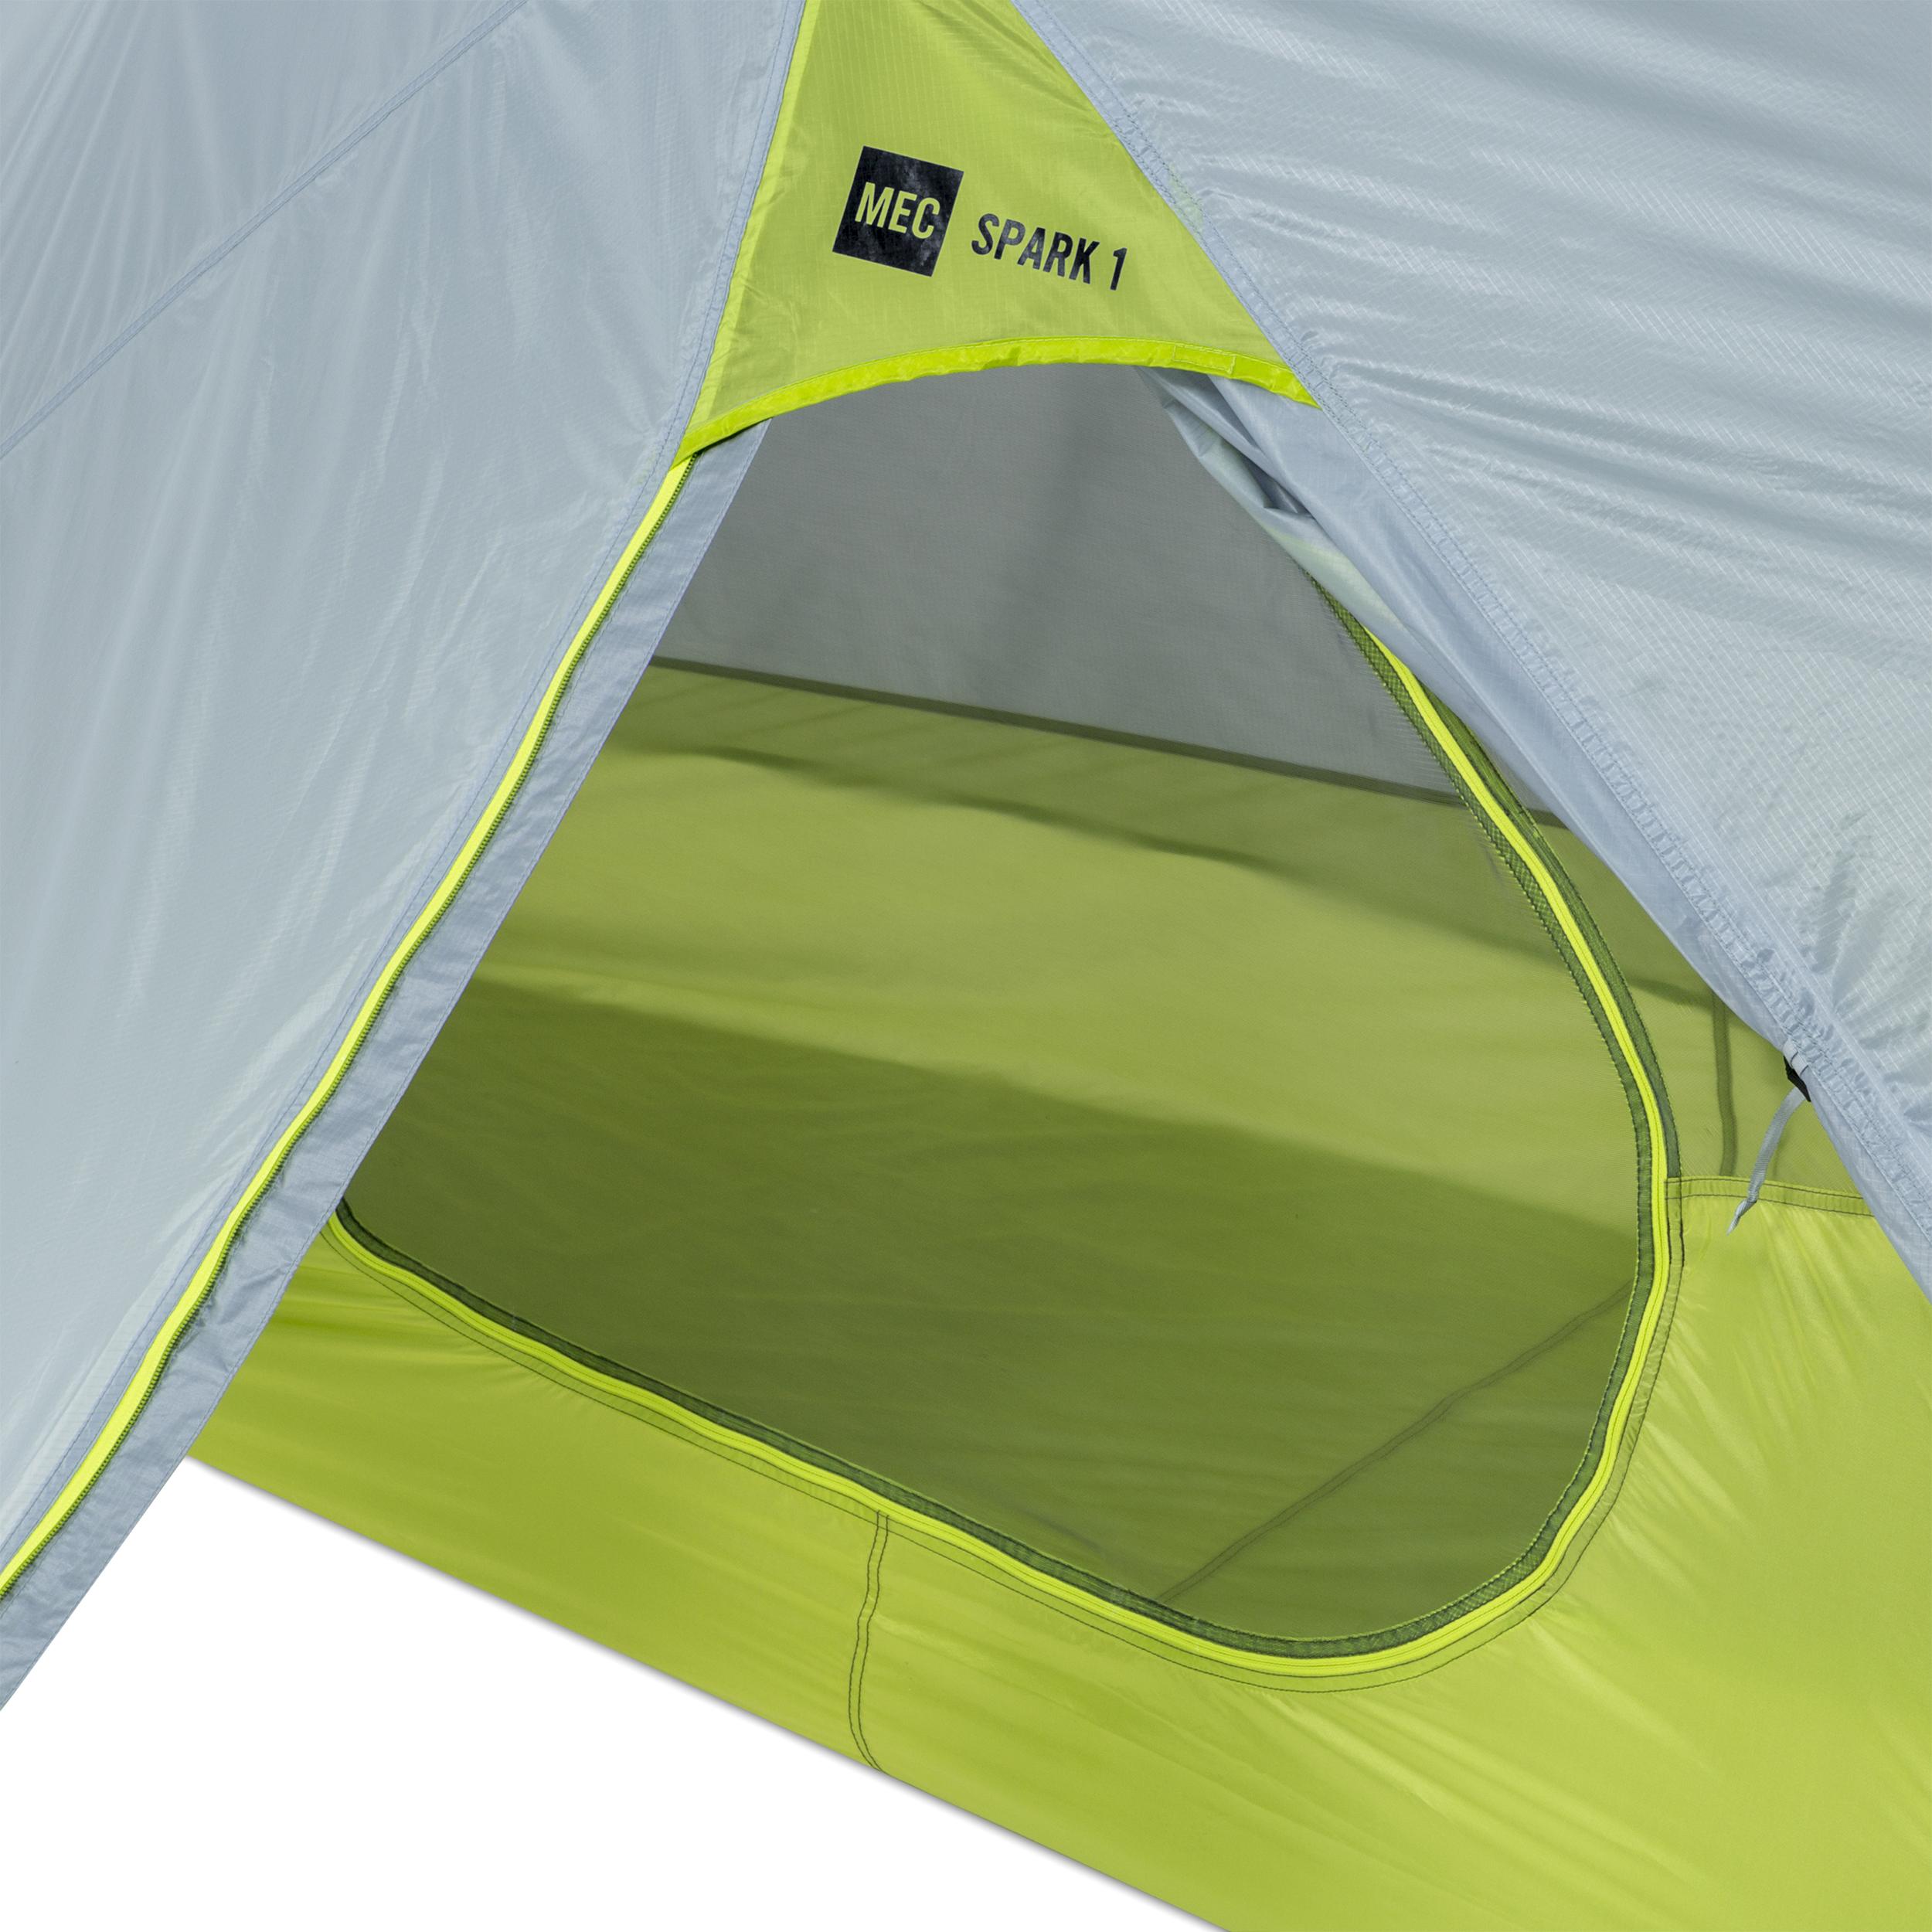 & MEC Spark 1 Tent